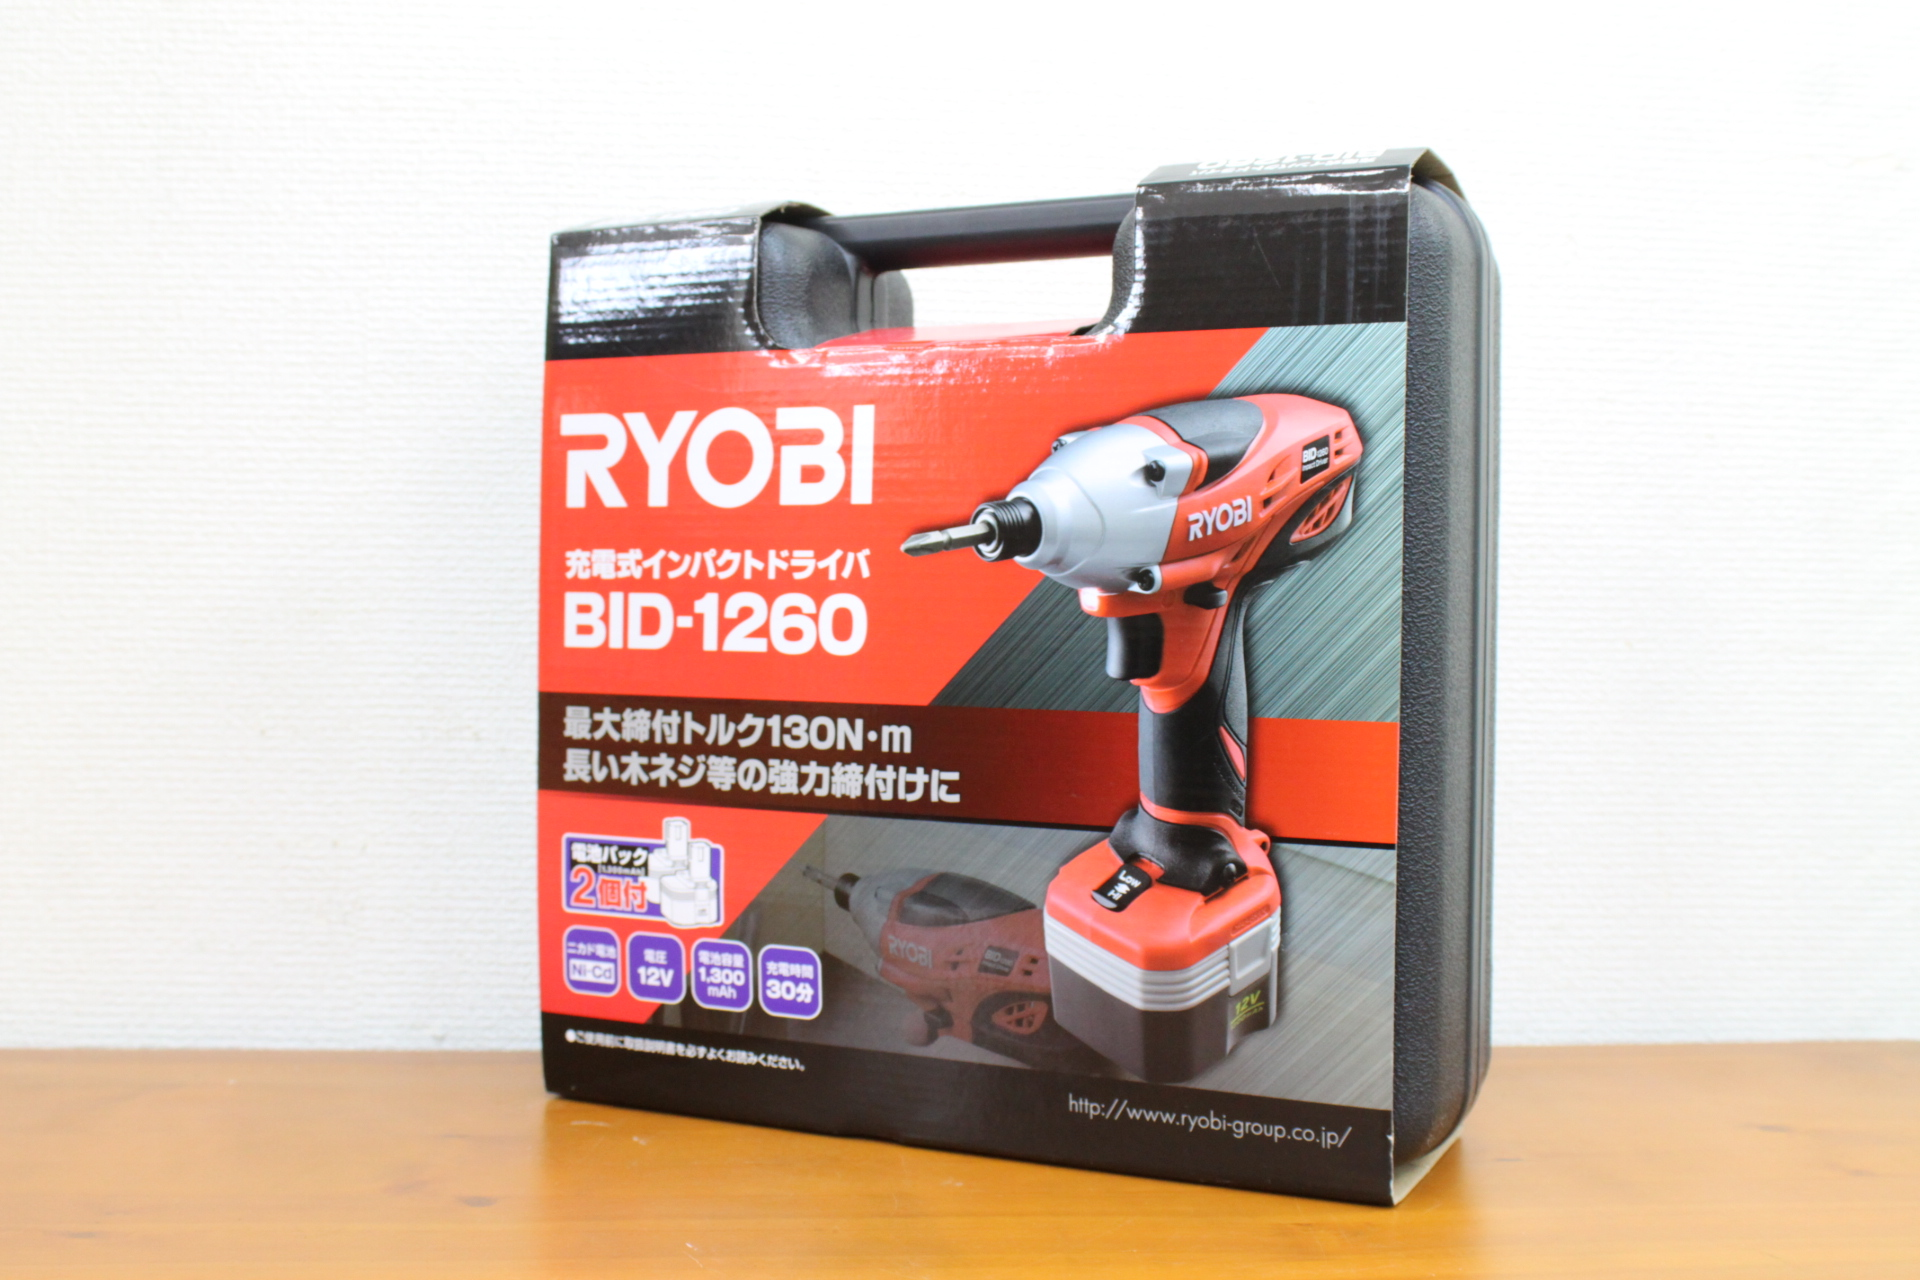 RYOBI リョービ インパクトドライバ BID-1260 充電式 電動 ドライバー をお買取り致しました☆ の買取-